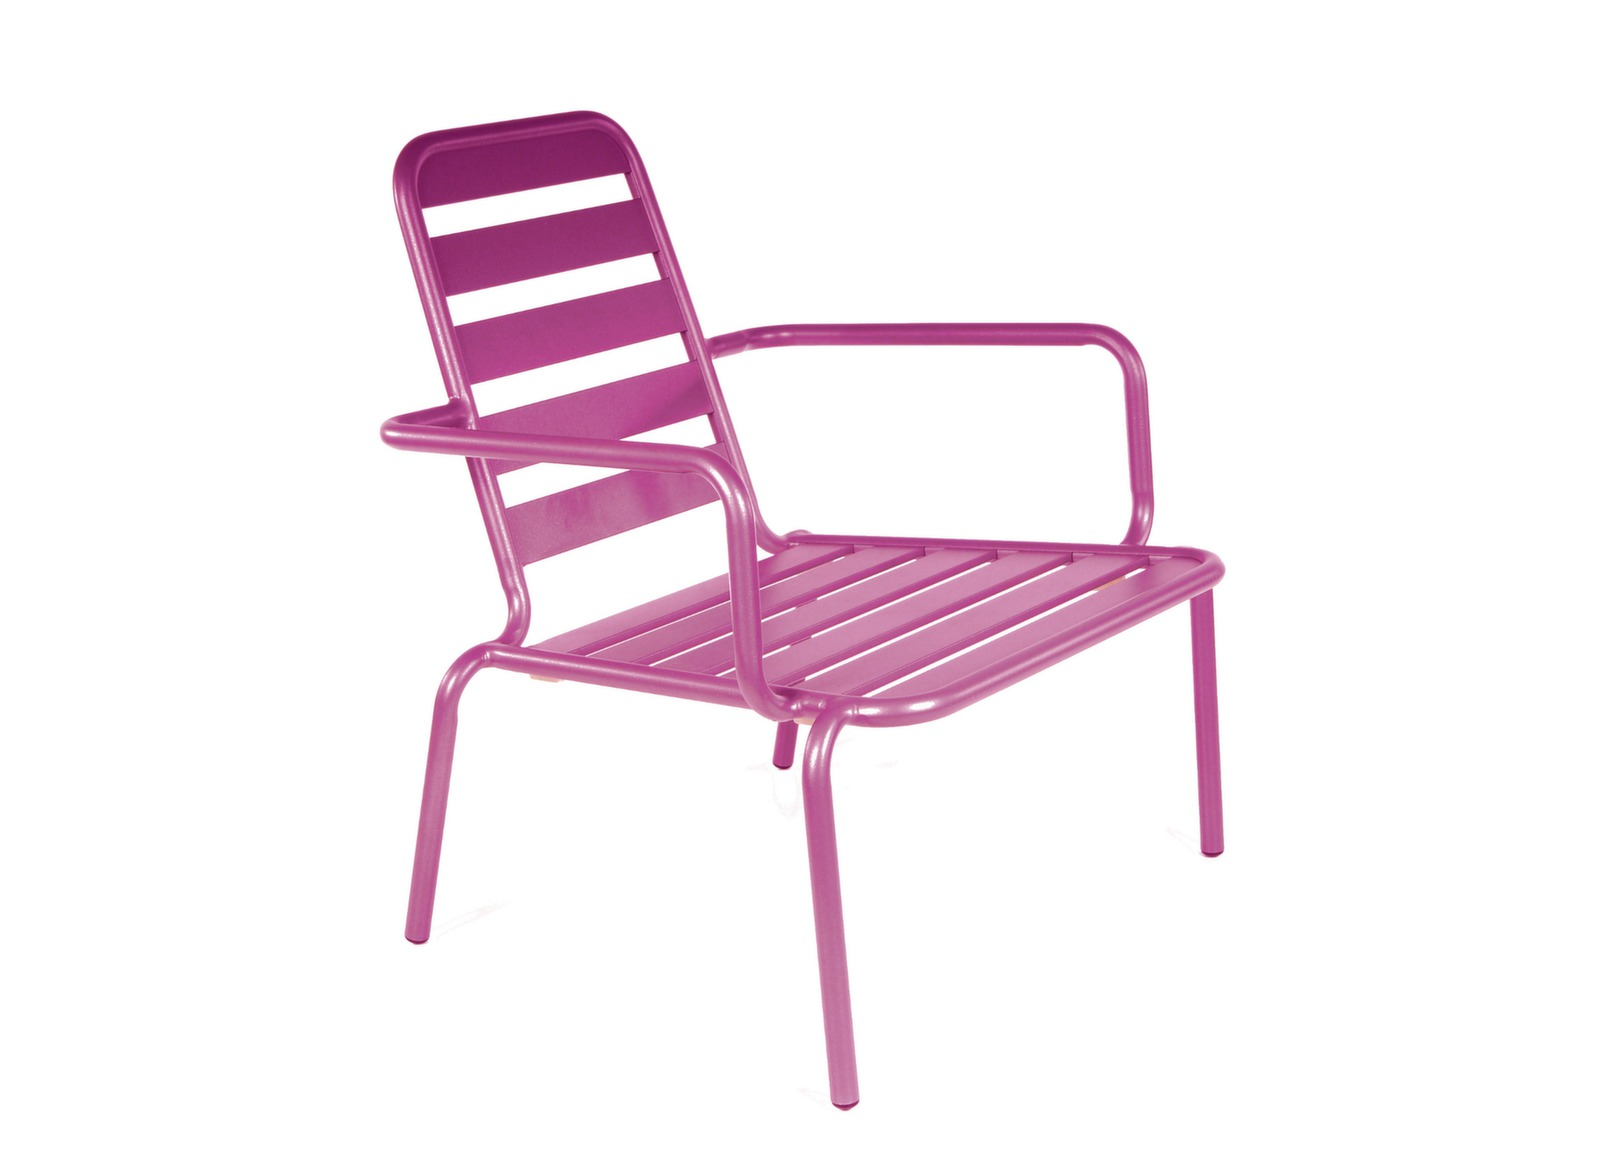 fauteuil lounge menu aubergine fauteuils de jardin mobilier pour salon de jardin repas. Black Bedroom Furniture Sets. Home Design Ideas